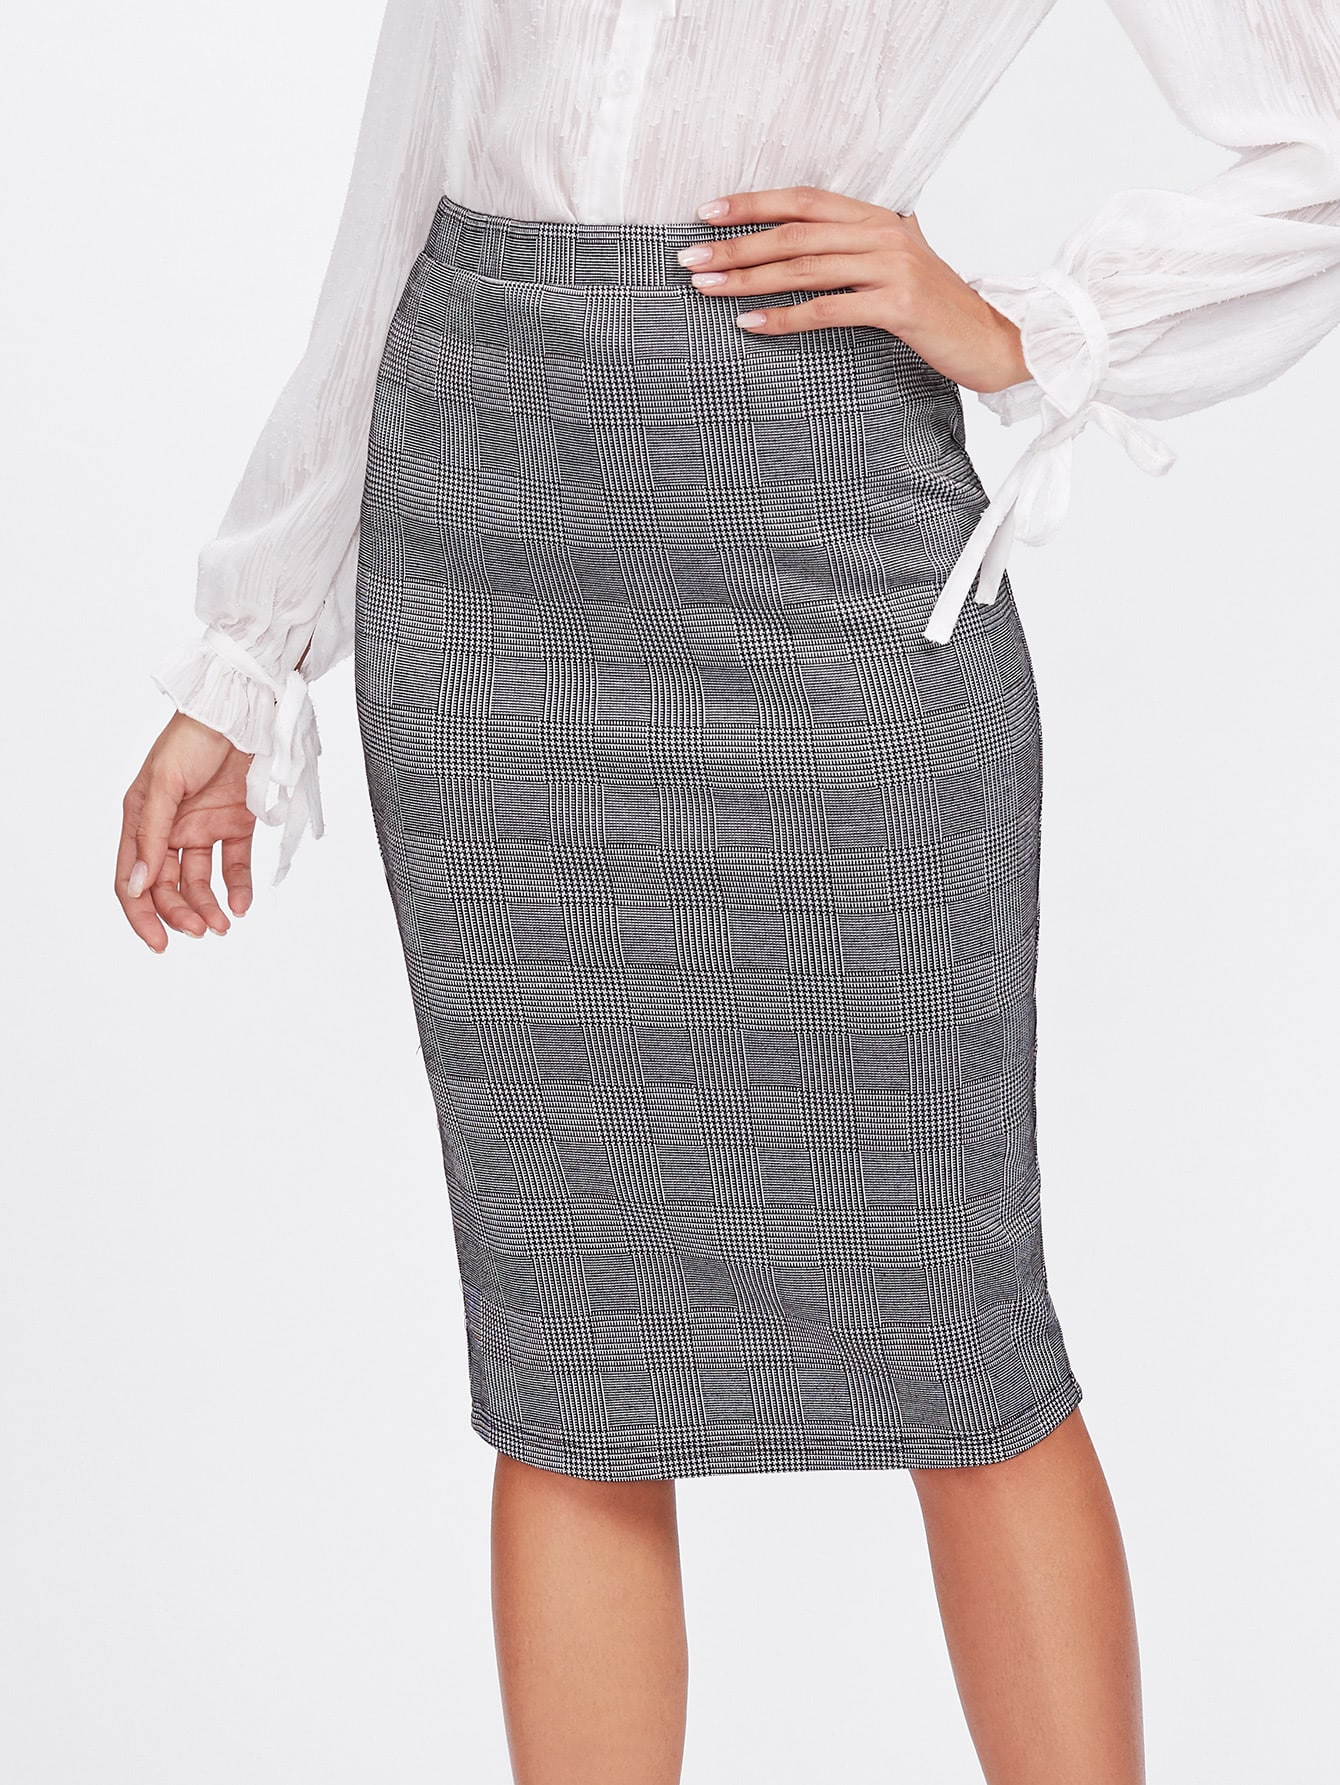 Vented Back Plaid Pencil Skirt